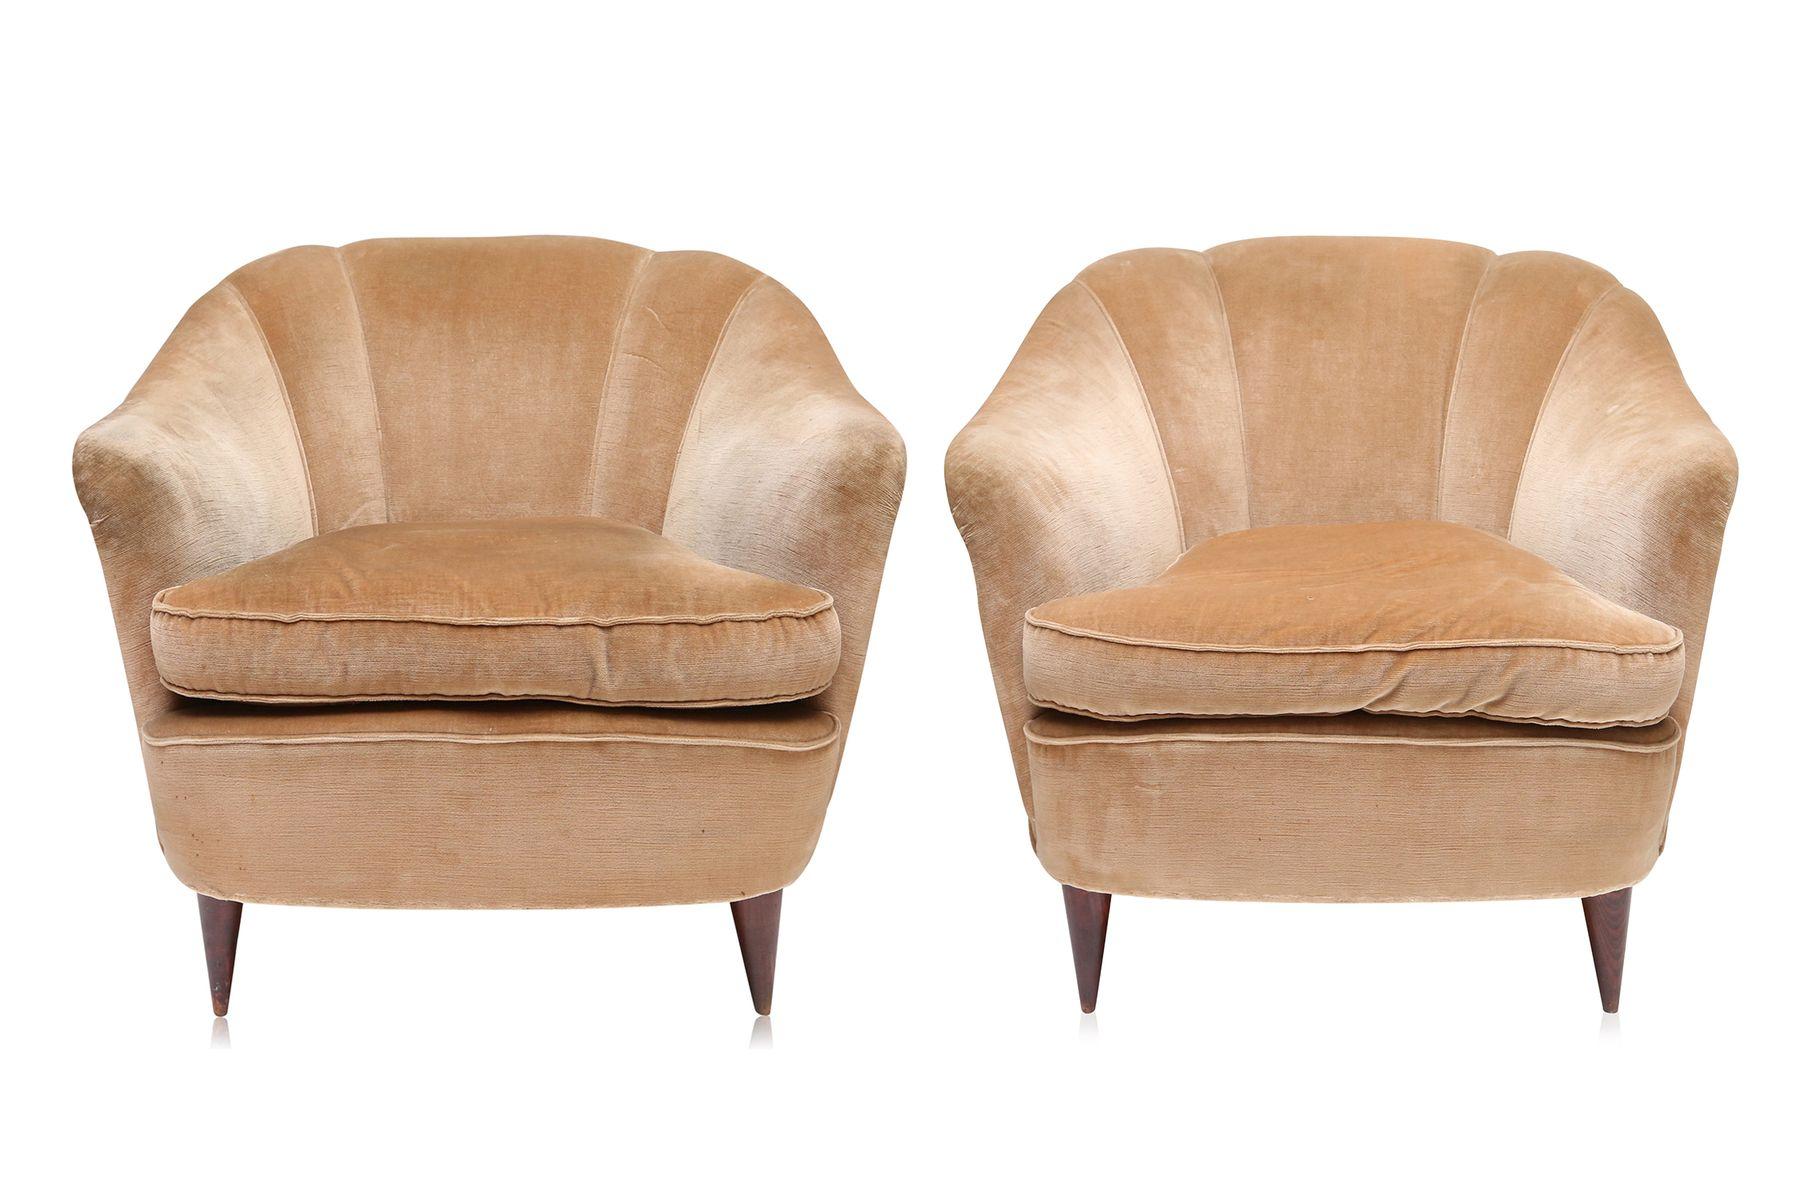 gold velvet chair big bean bag chairs for kids art deco light club 1940s set of 2